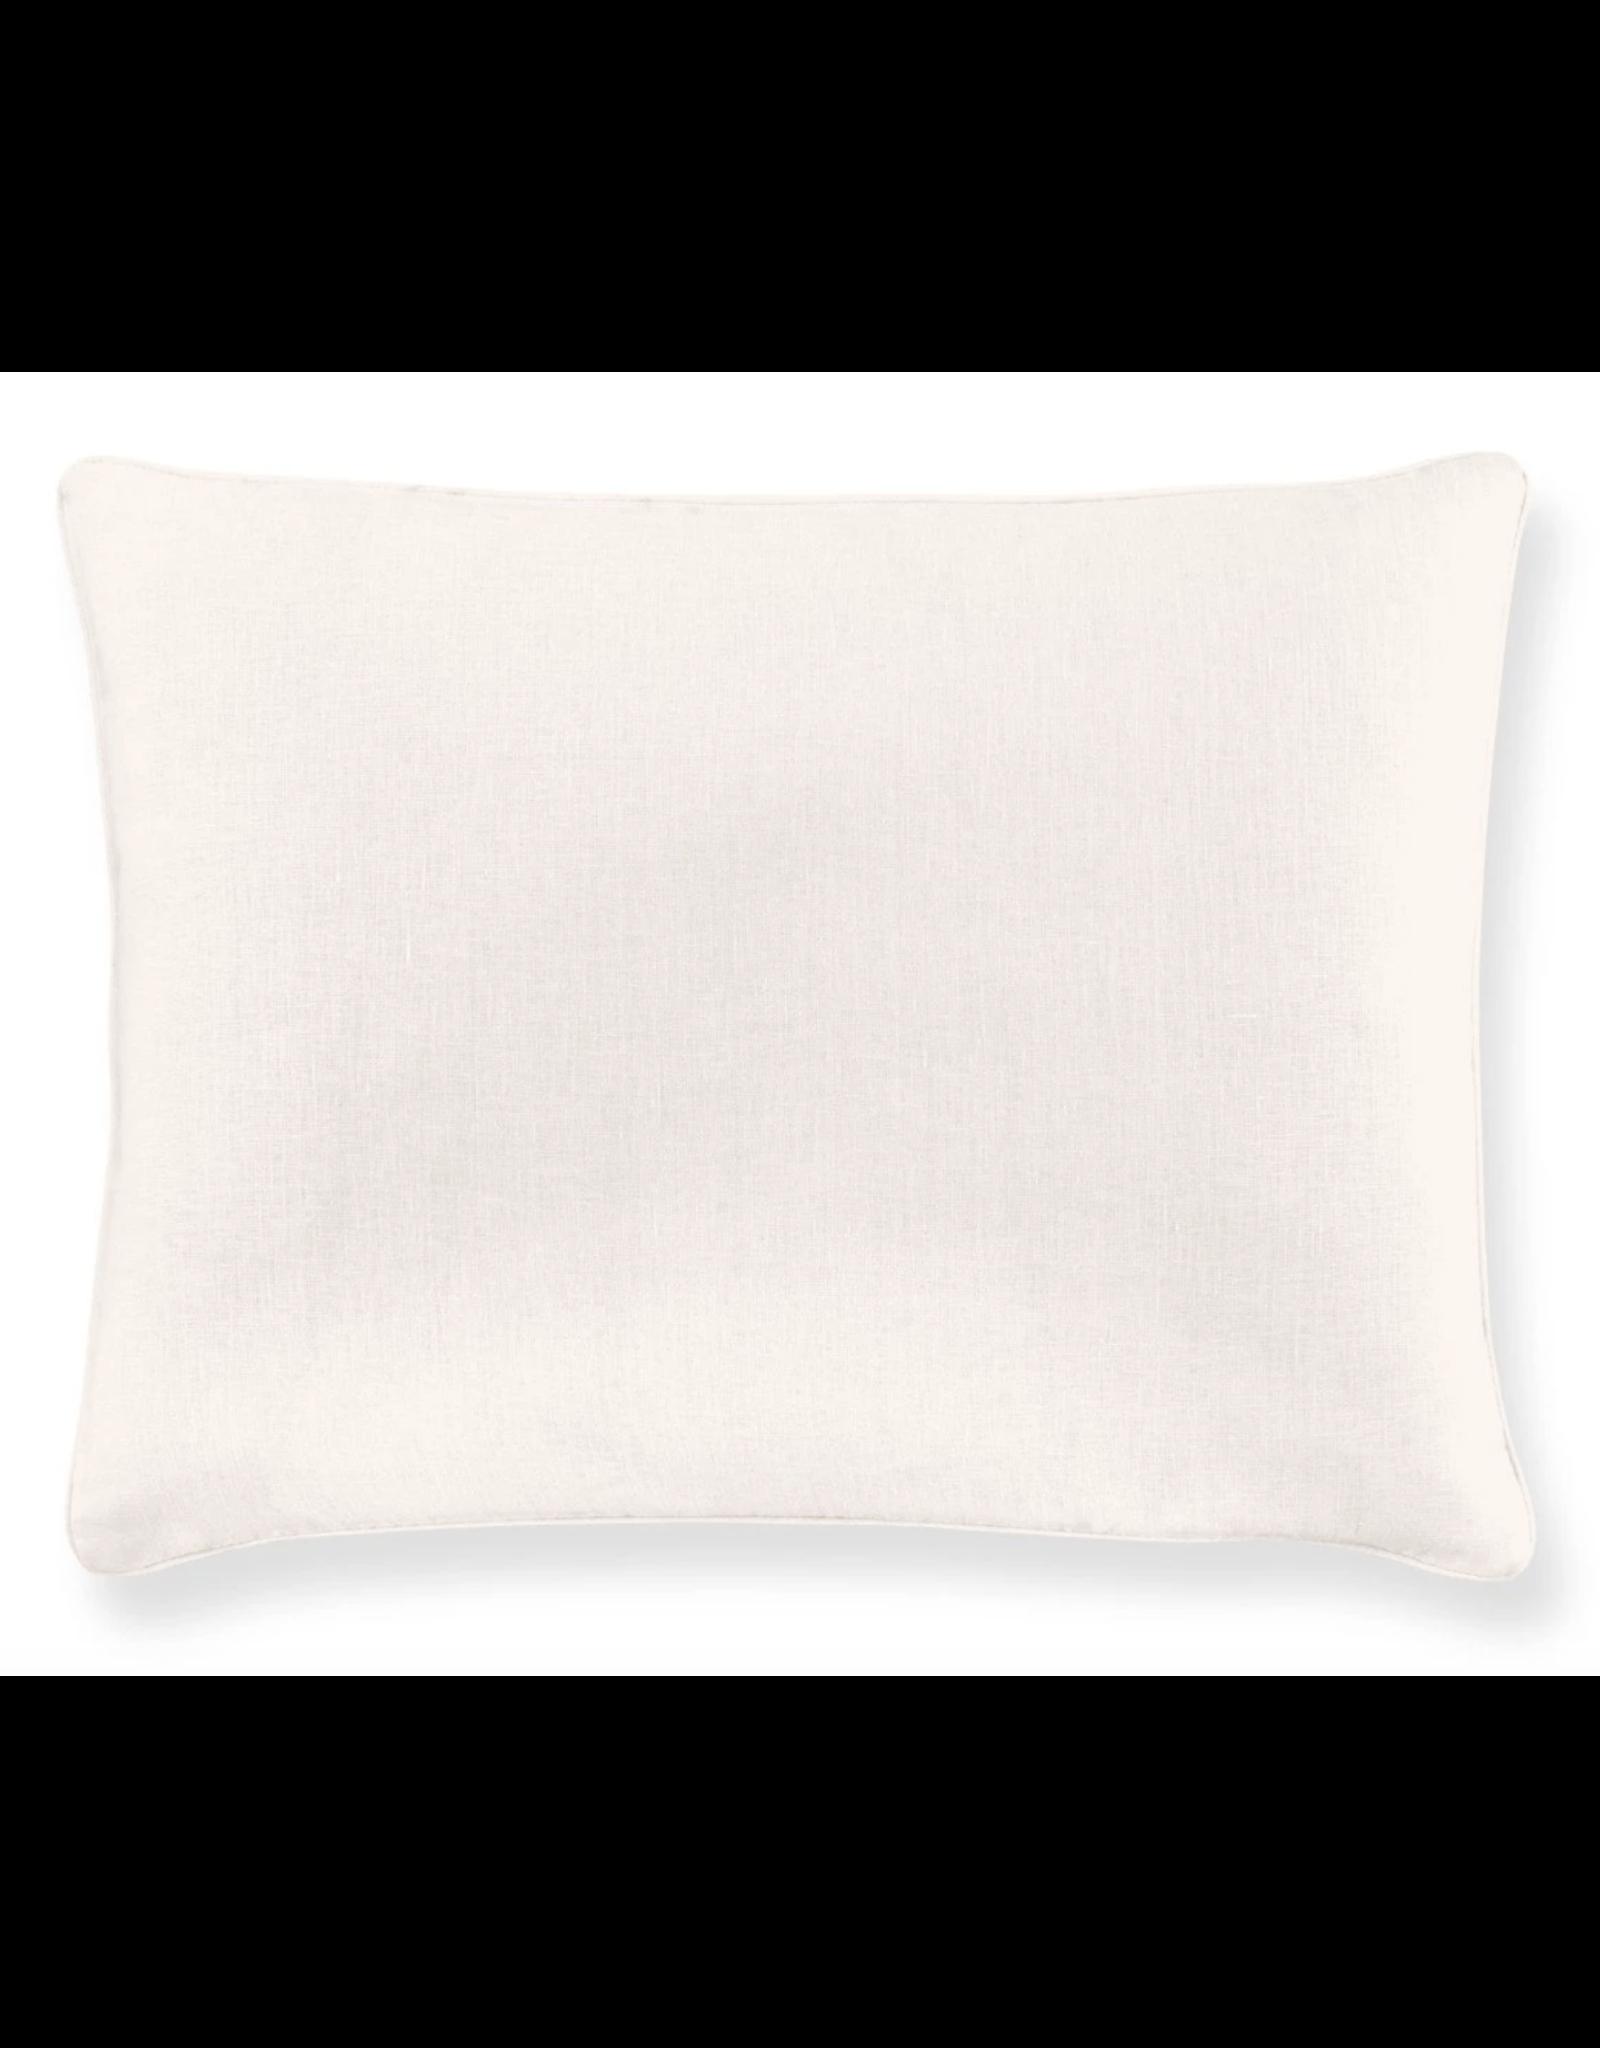 Mandaly Linen